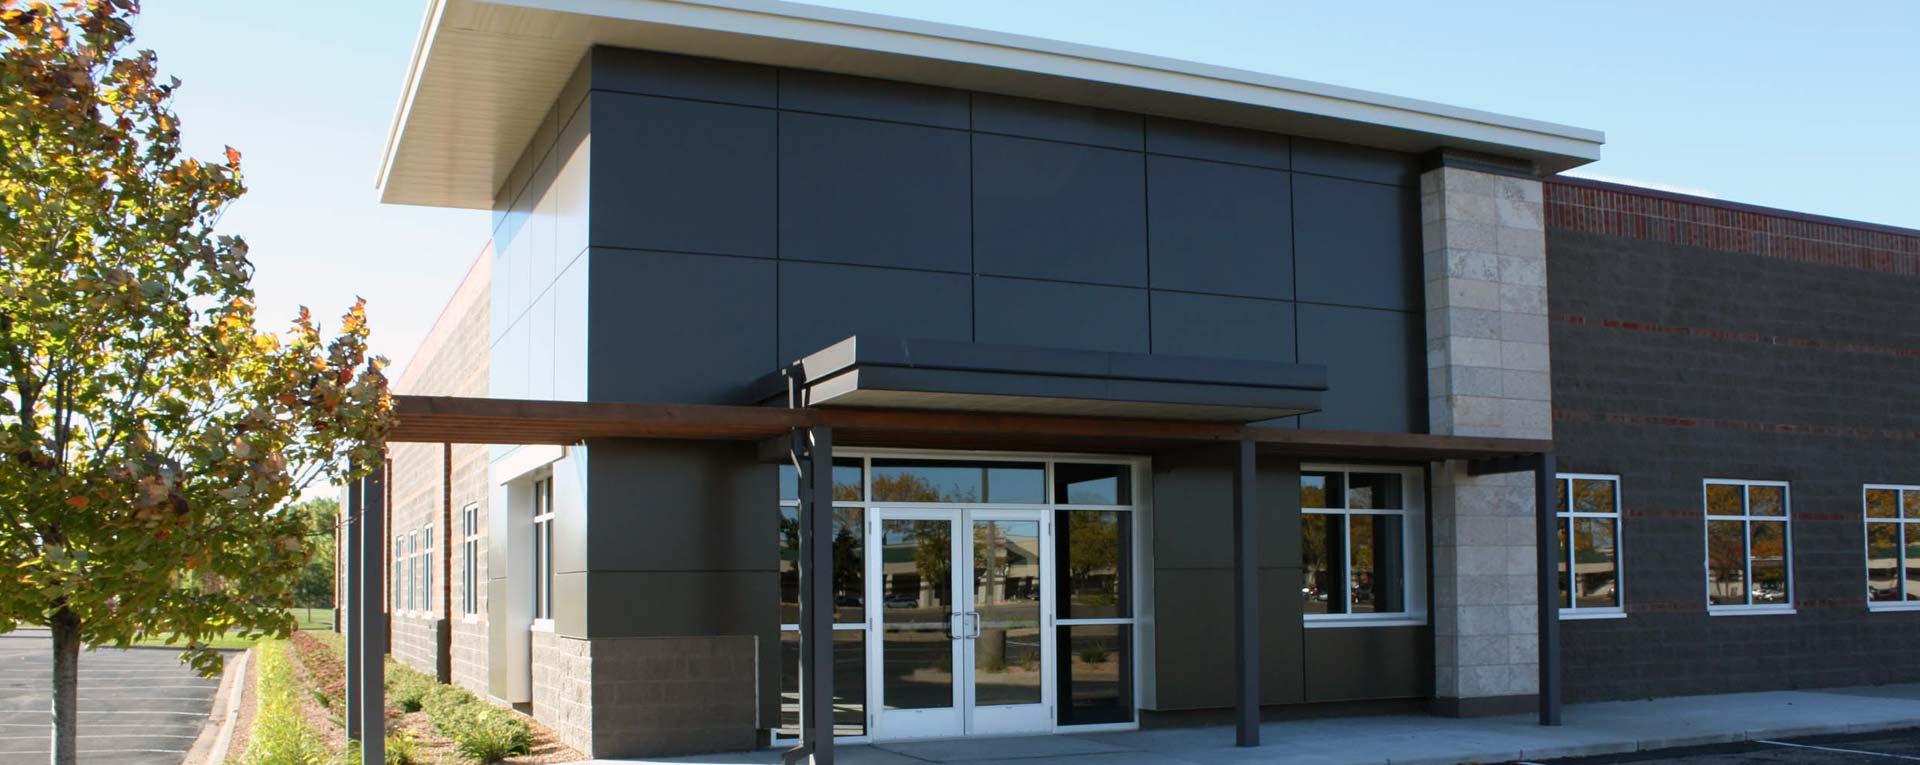 Birch Run Health Care Building